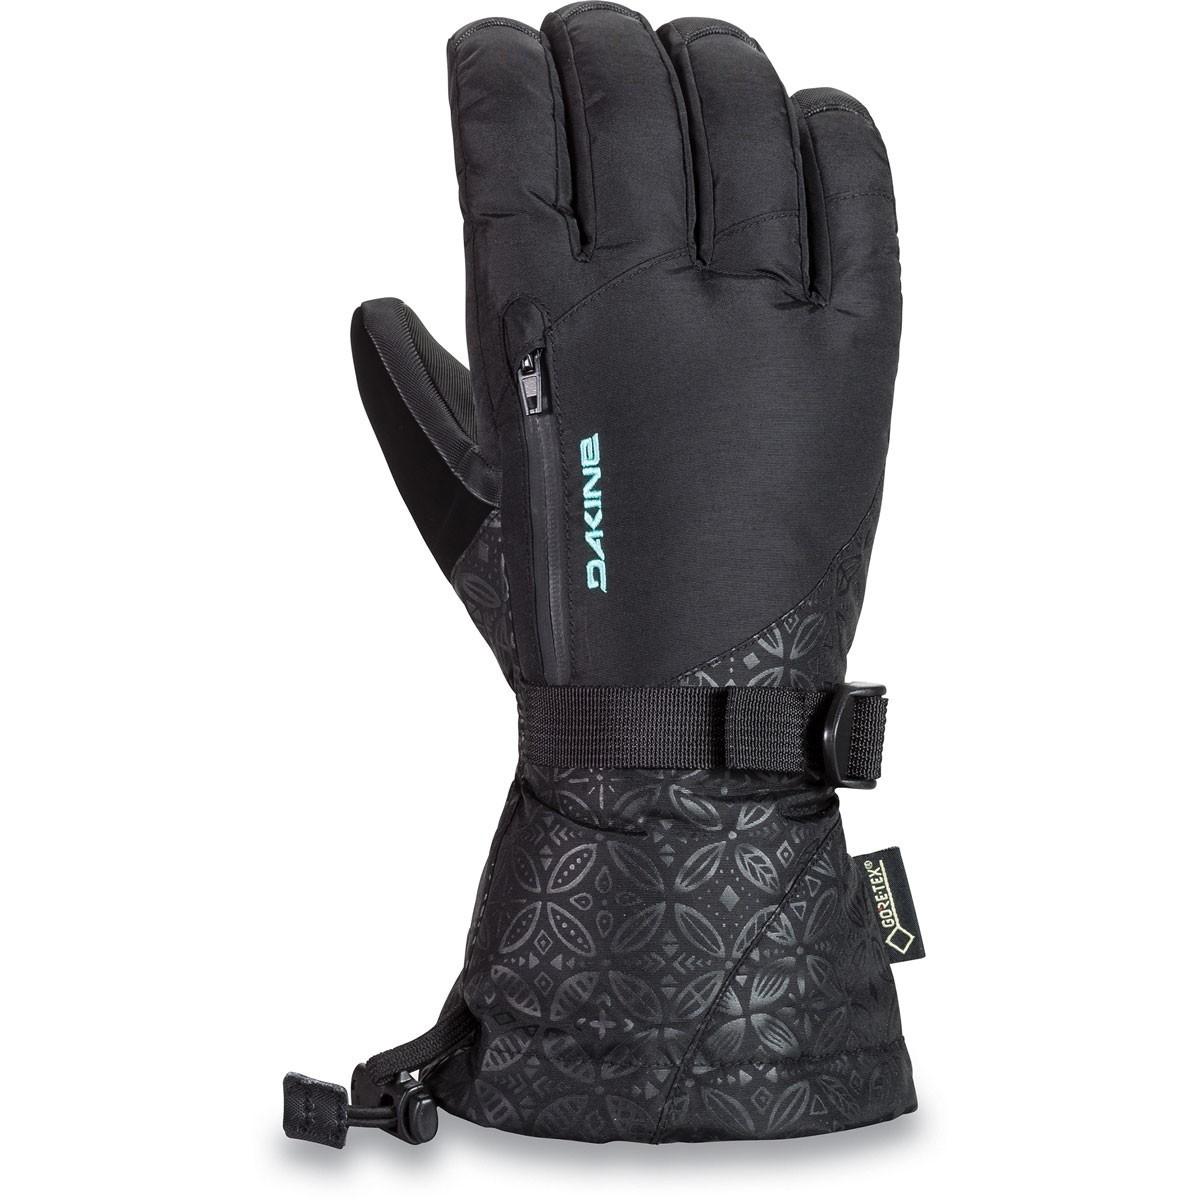 Dakine dames ski of snowboard handschoen Sequoia Gore Tex